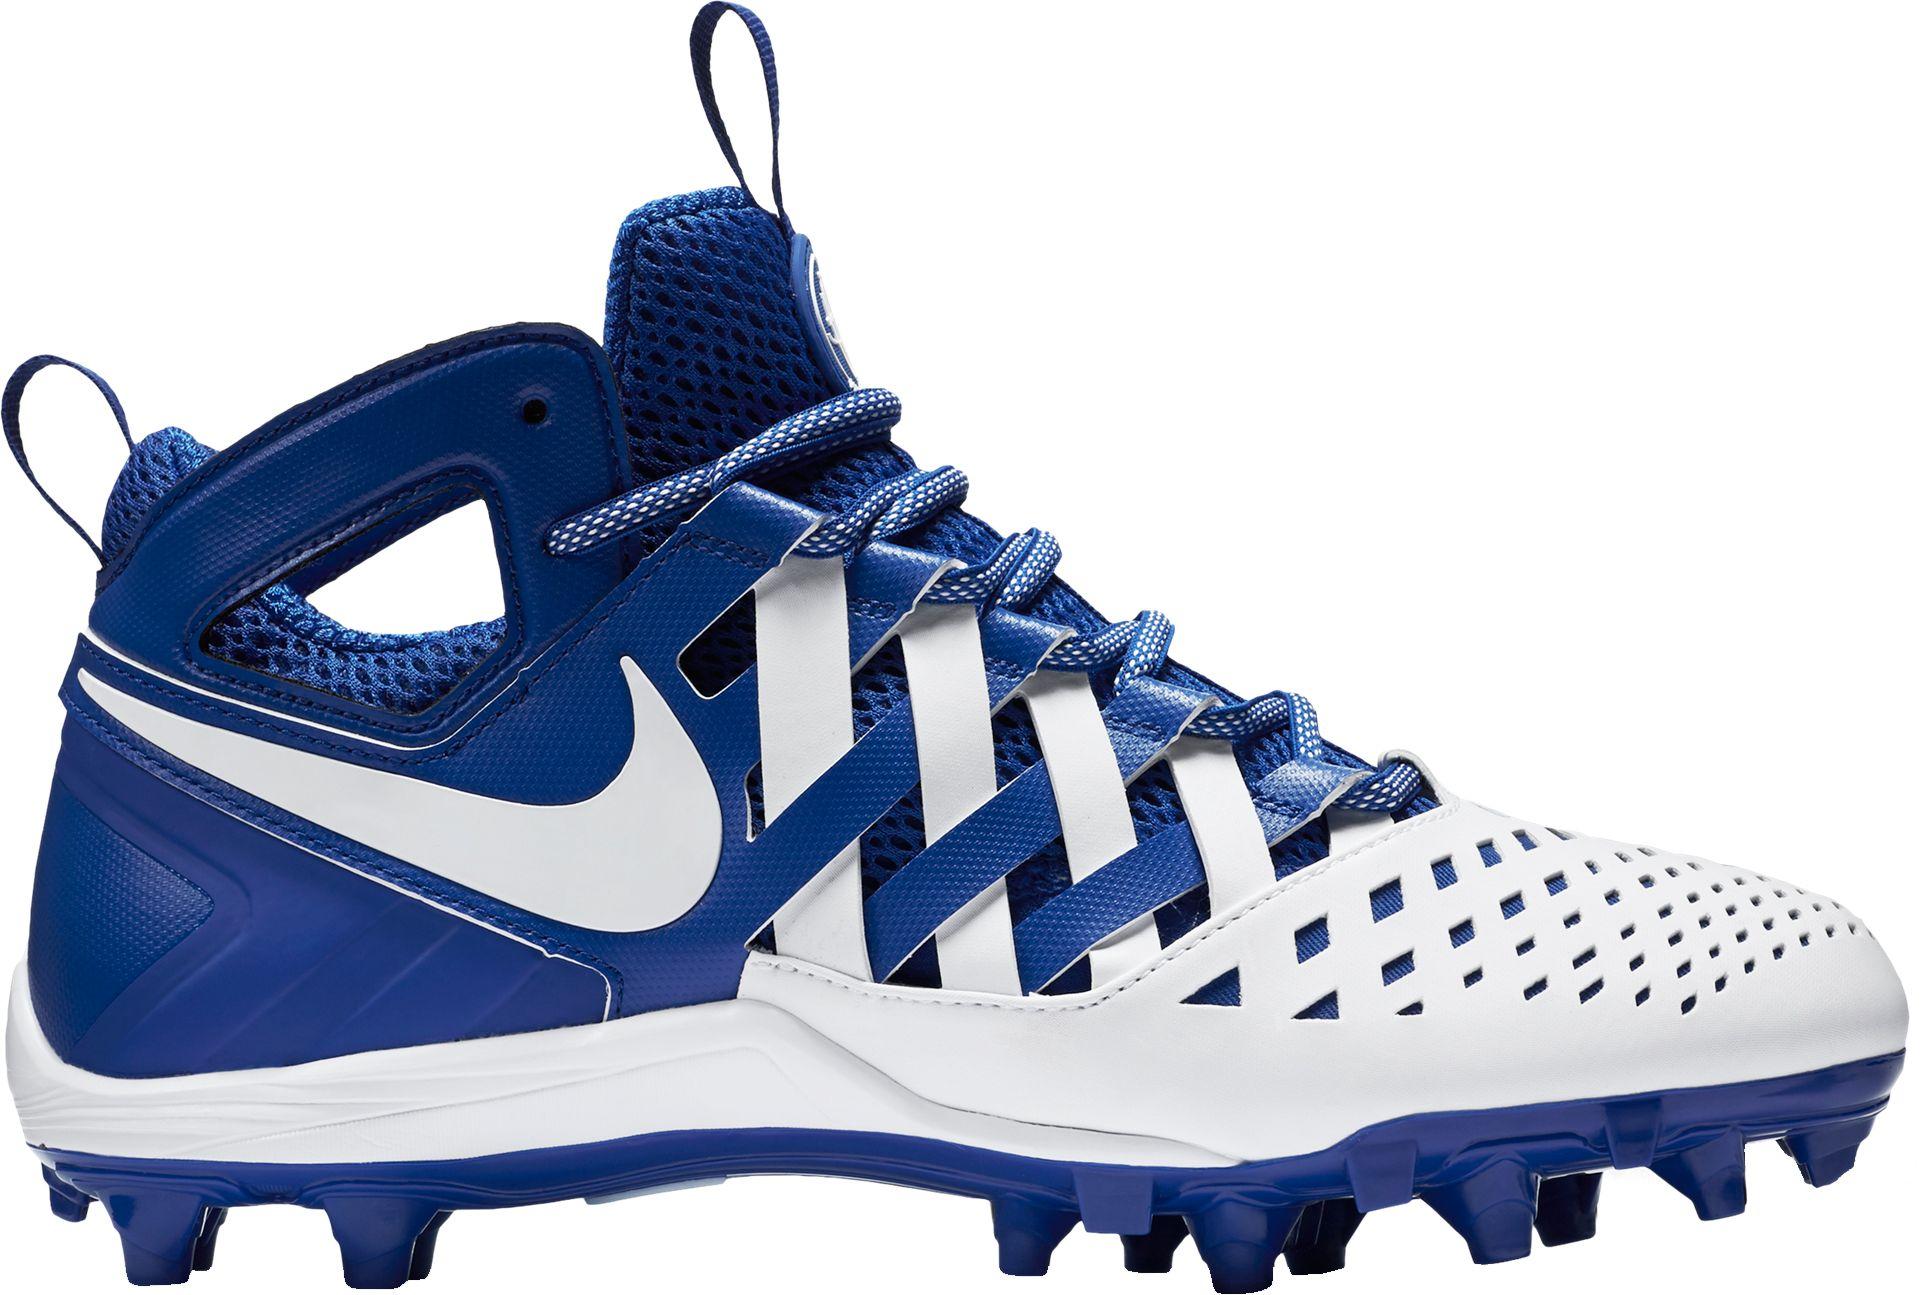 Nike Men's Huarache V Lax Mid Lacrosse Cleats. 0:00. 0:00 / 0:00.  noImageFound ???